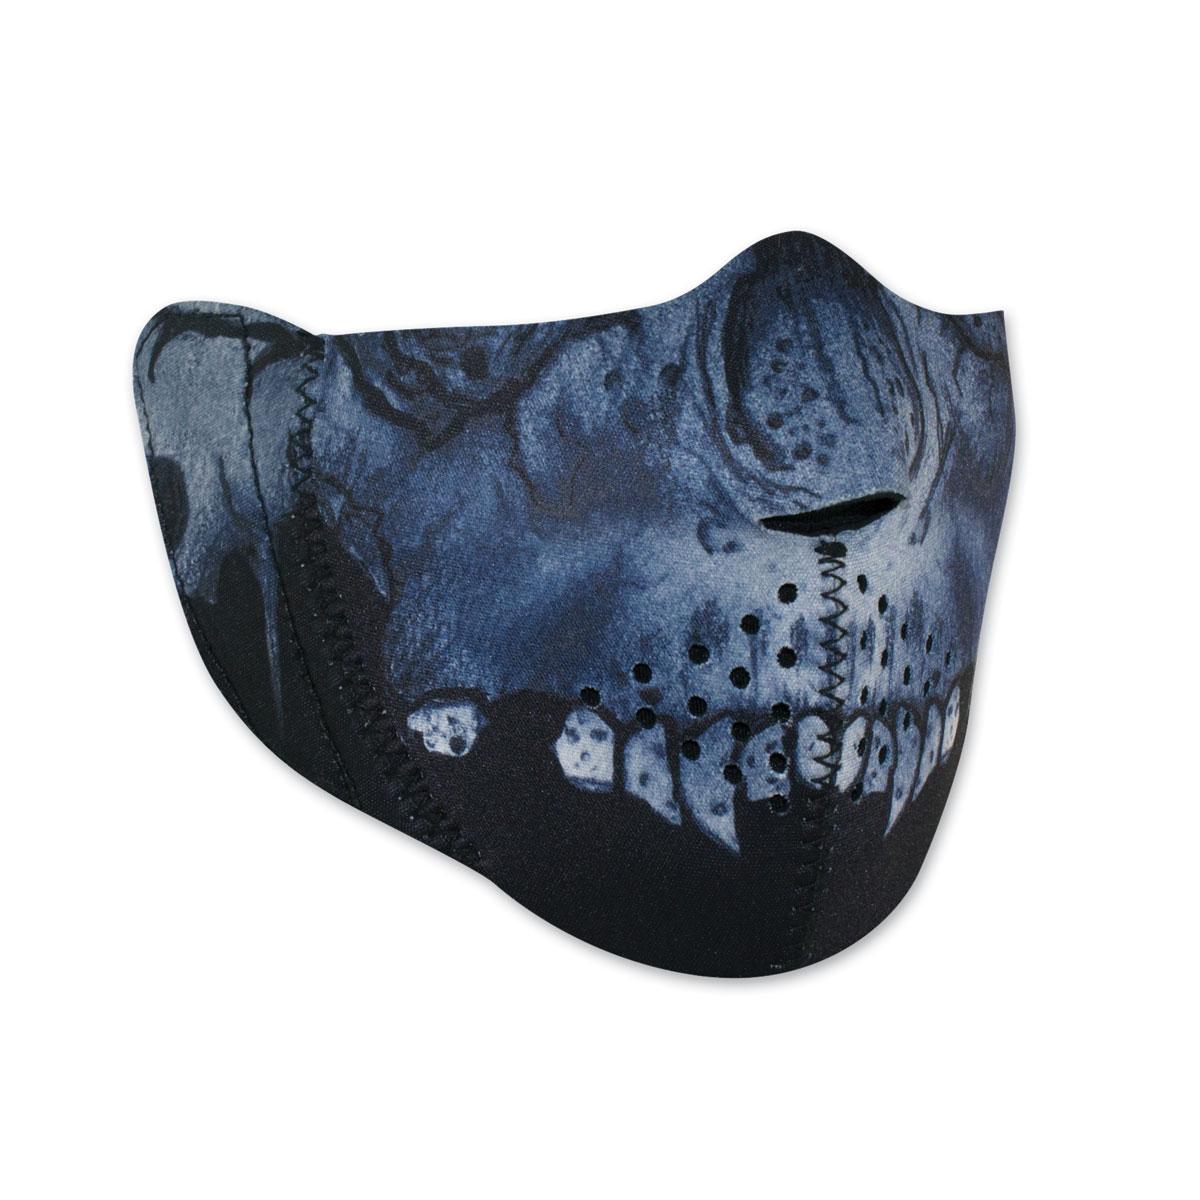 ZAN headgear Modi-Face Neoprene Midnight Skull Half Mask